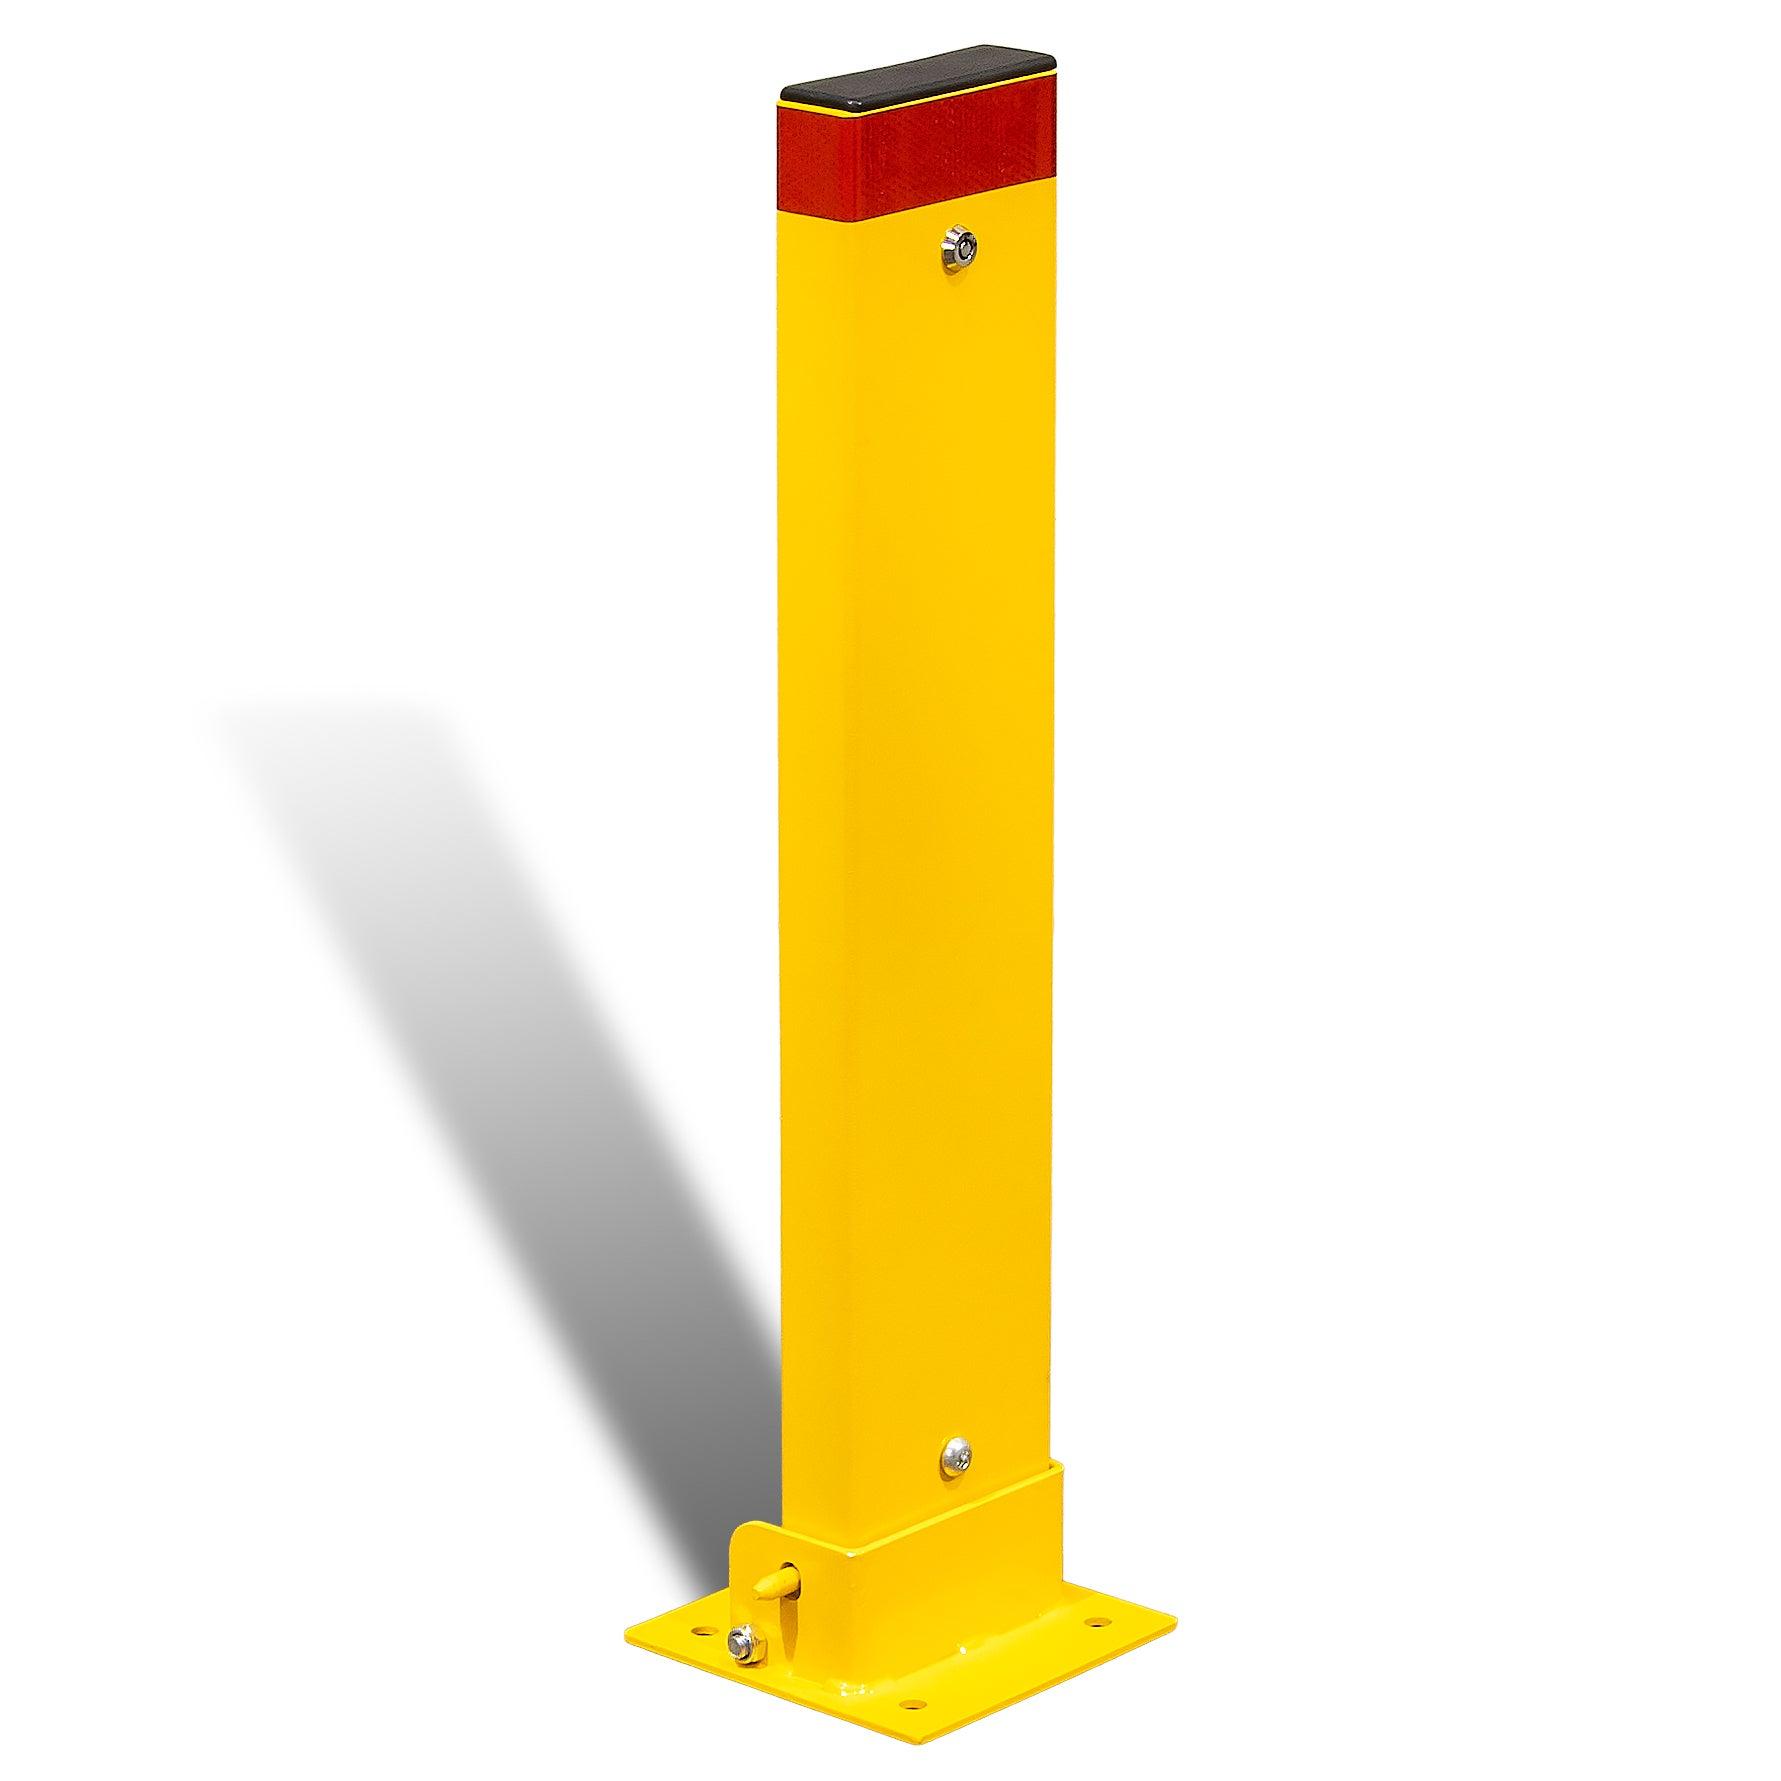 Bollard - Parking Protector / Key Lock